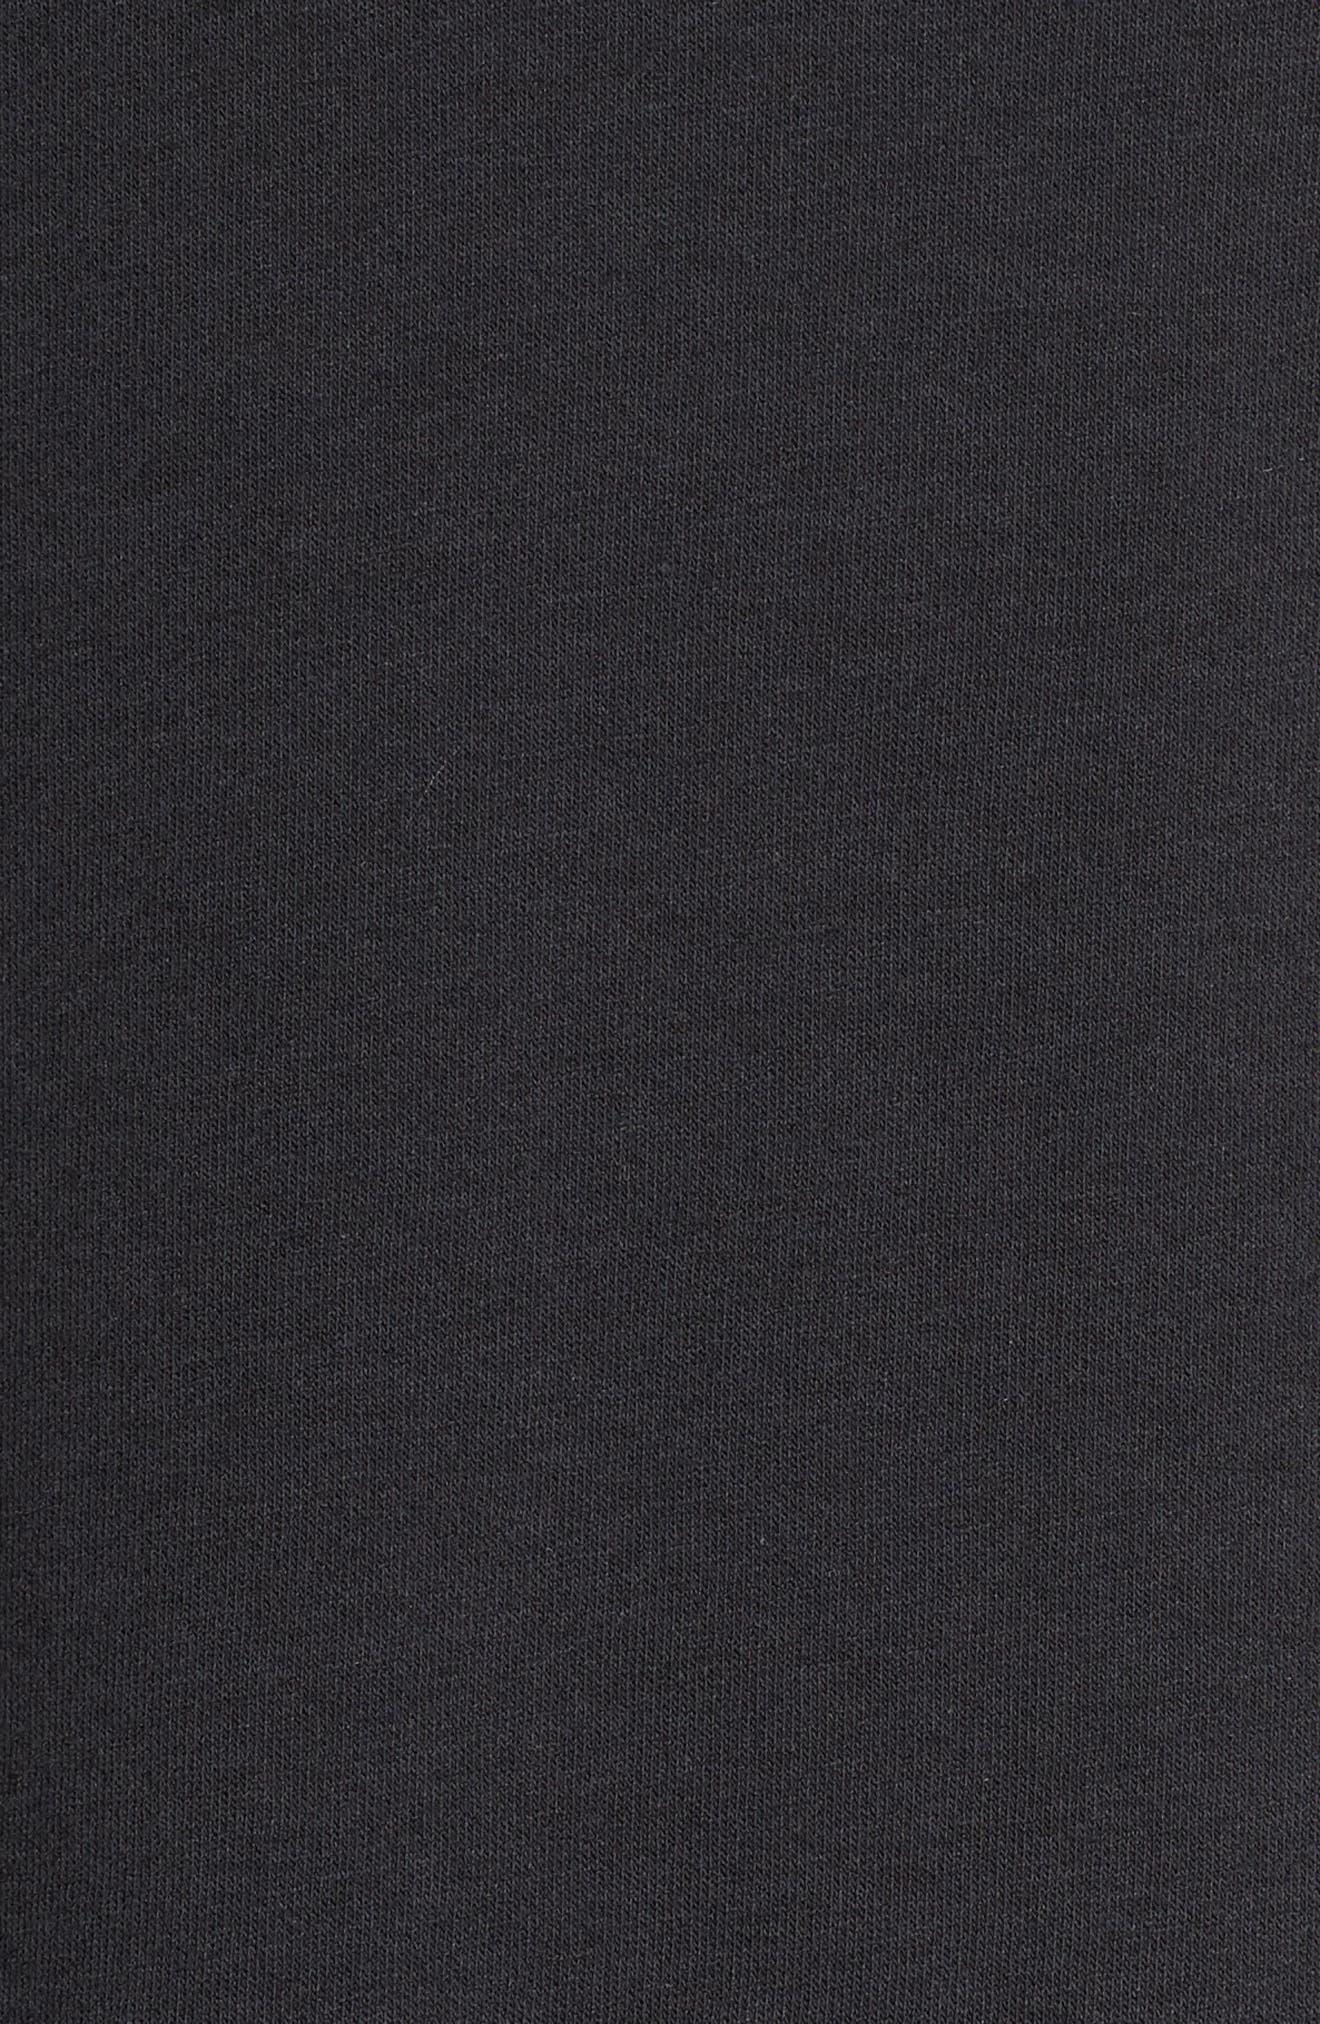 Sportswear Rally Sweatshirt,                             Alternate thumbnail 6, color,                             Black/ White